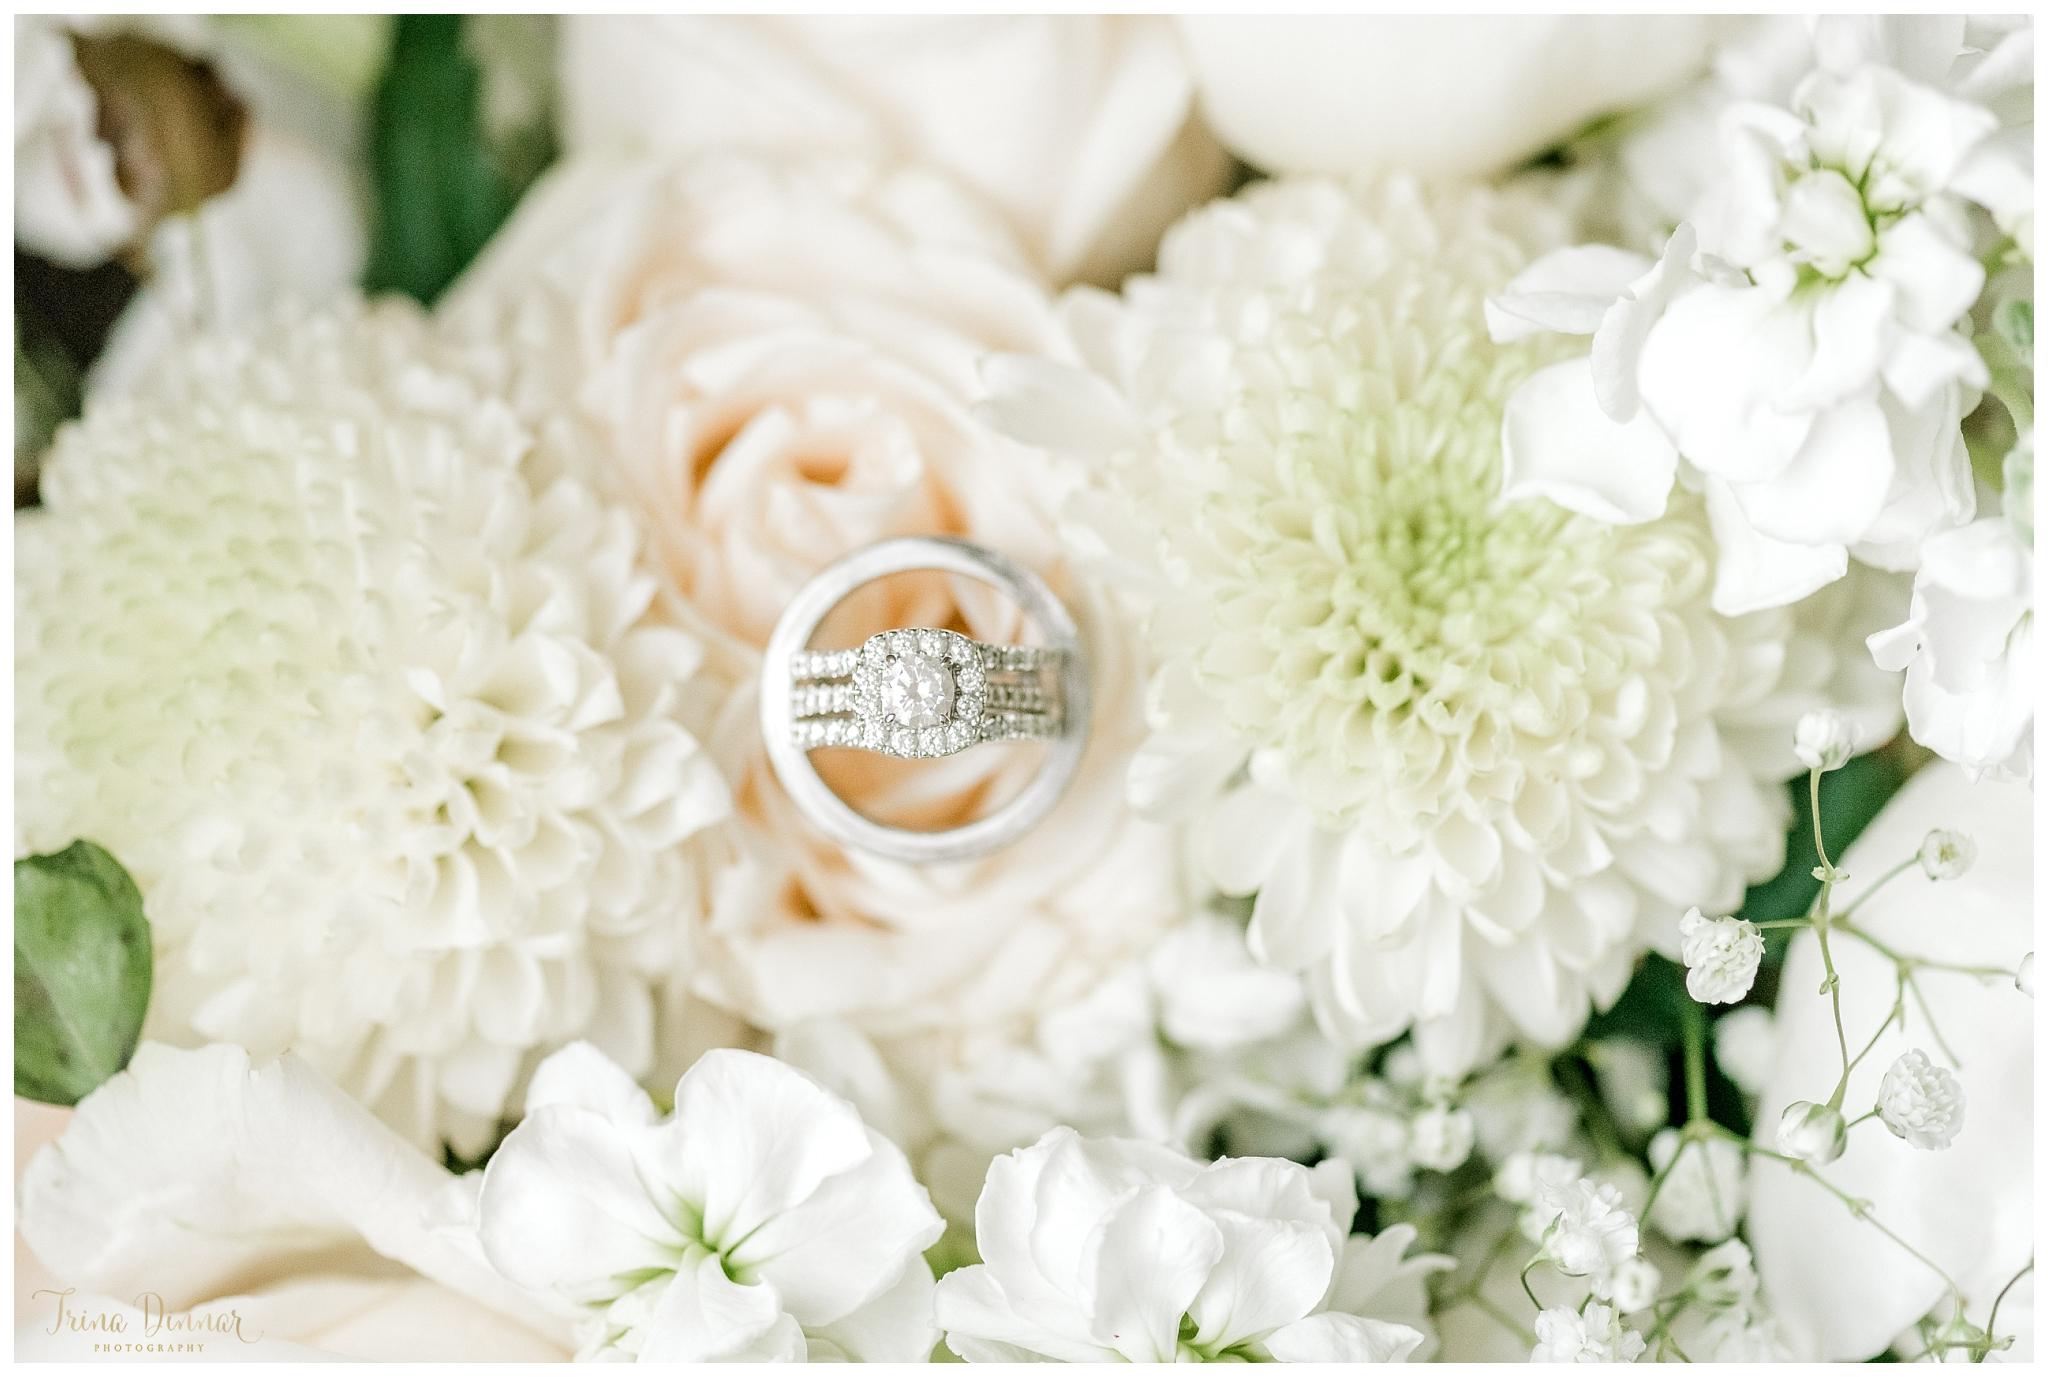 Coast of Maine Weddings Florist Bridal Bouquet